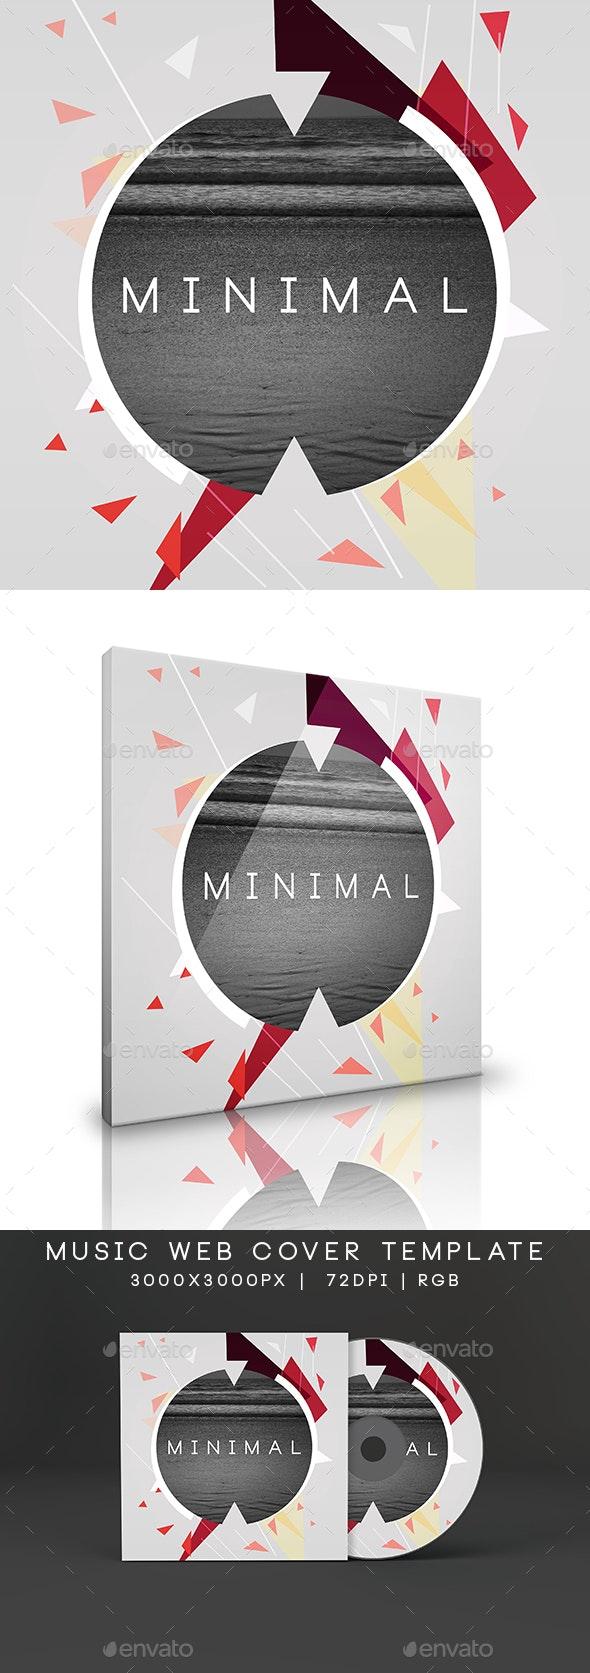 Minimal Music Cover Album Artwork Template - Miscellaneous Social Media